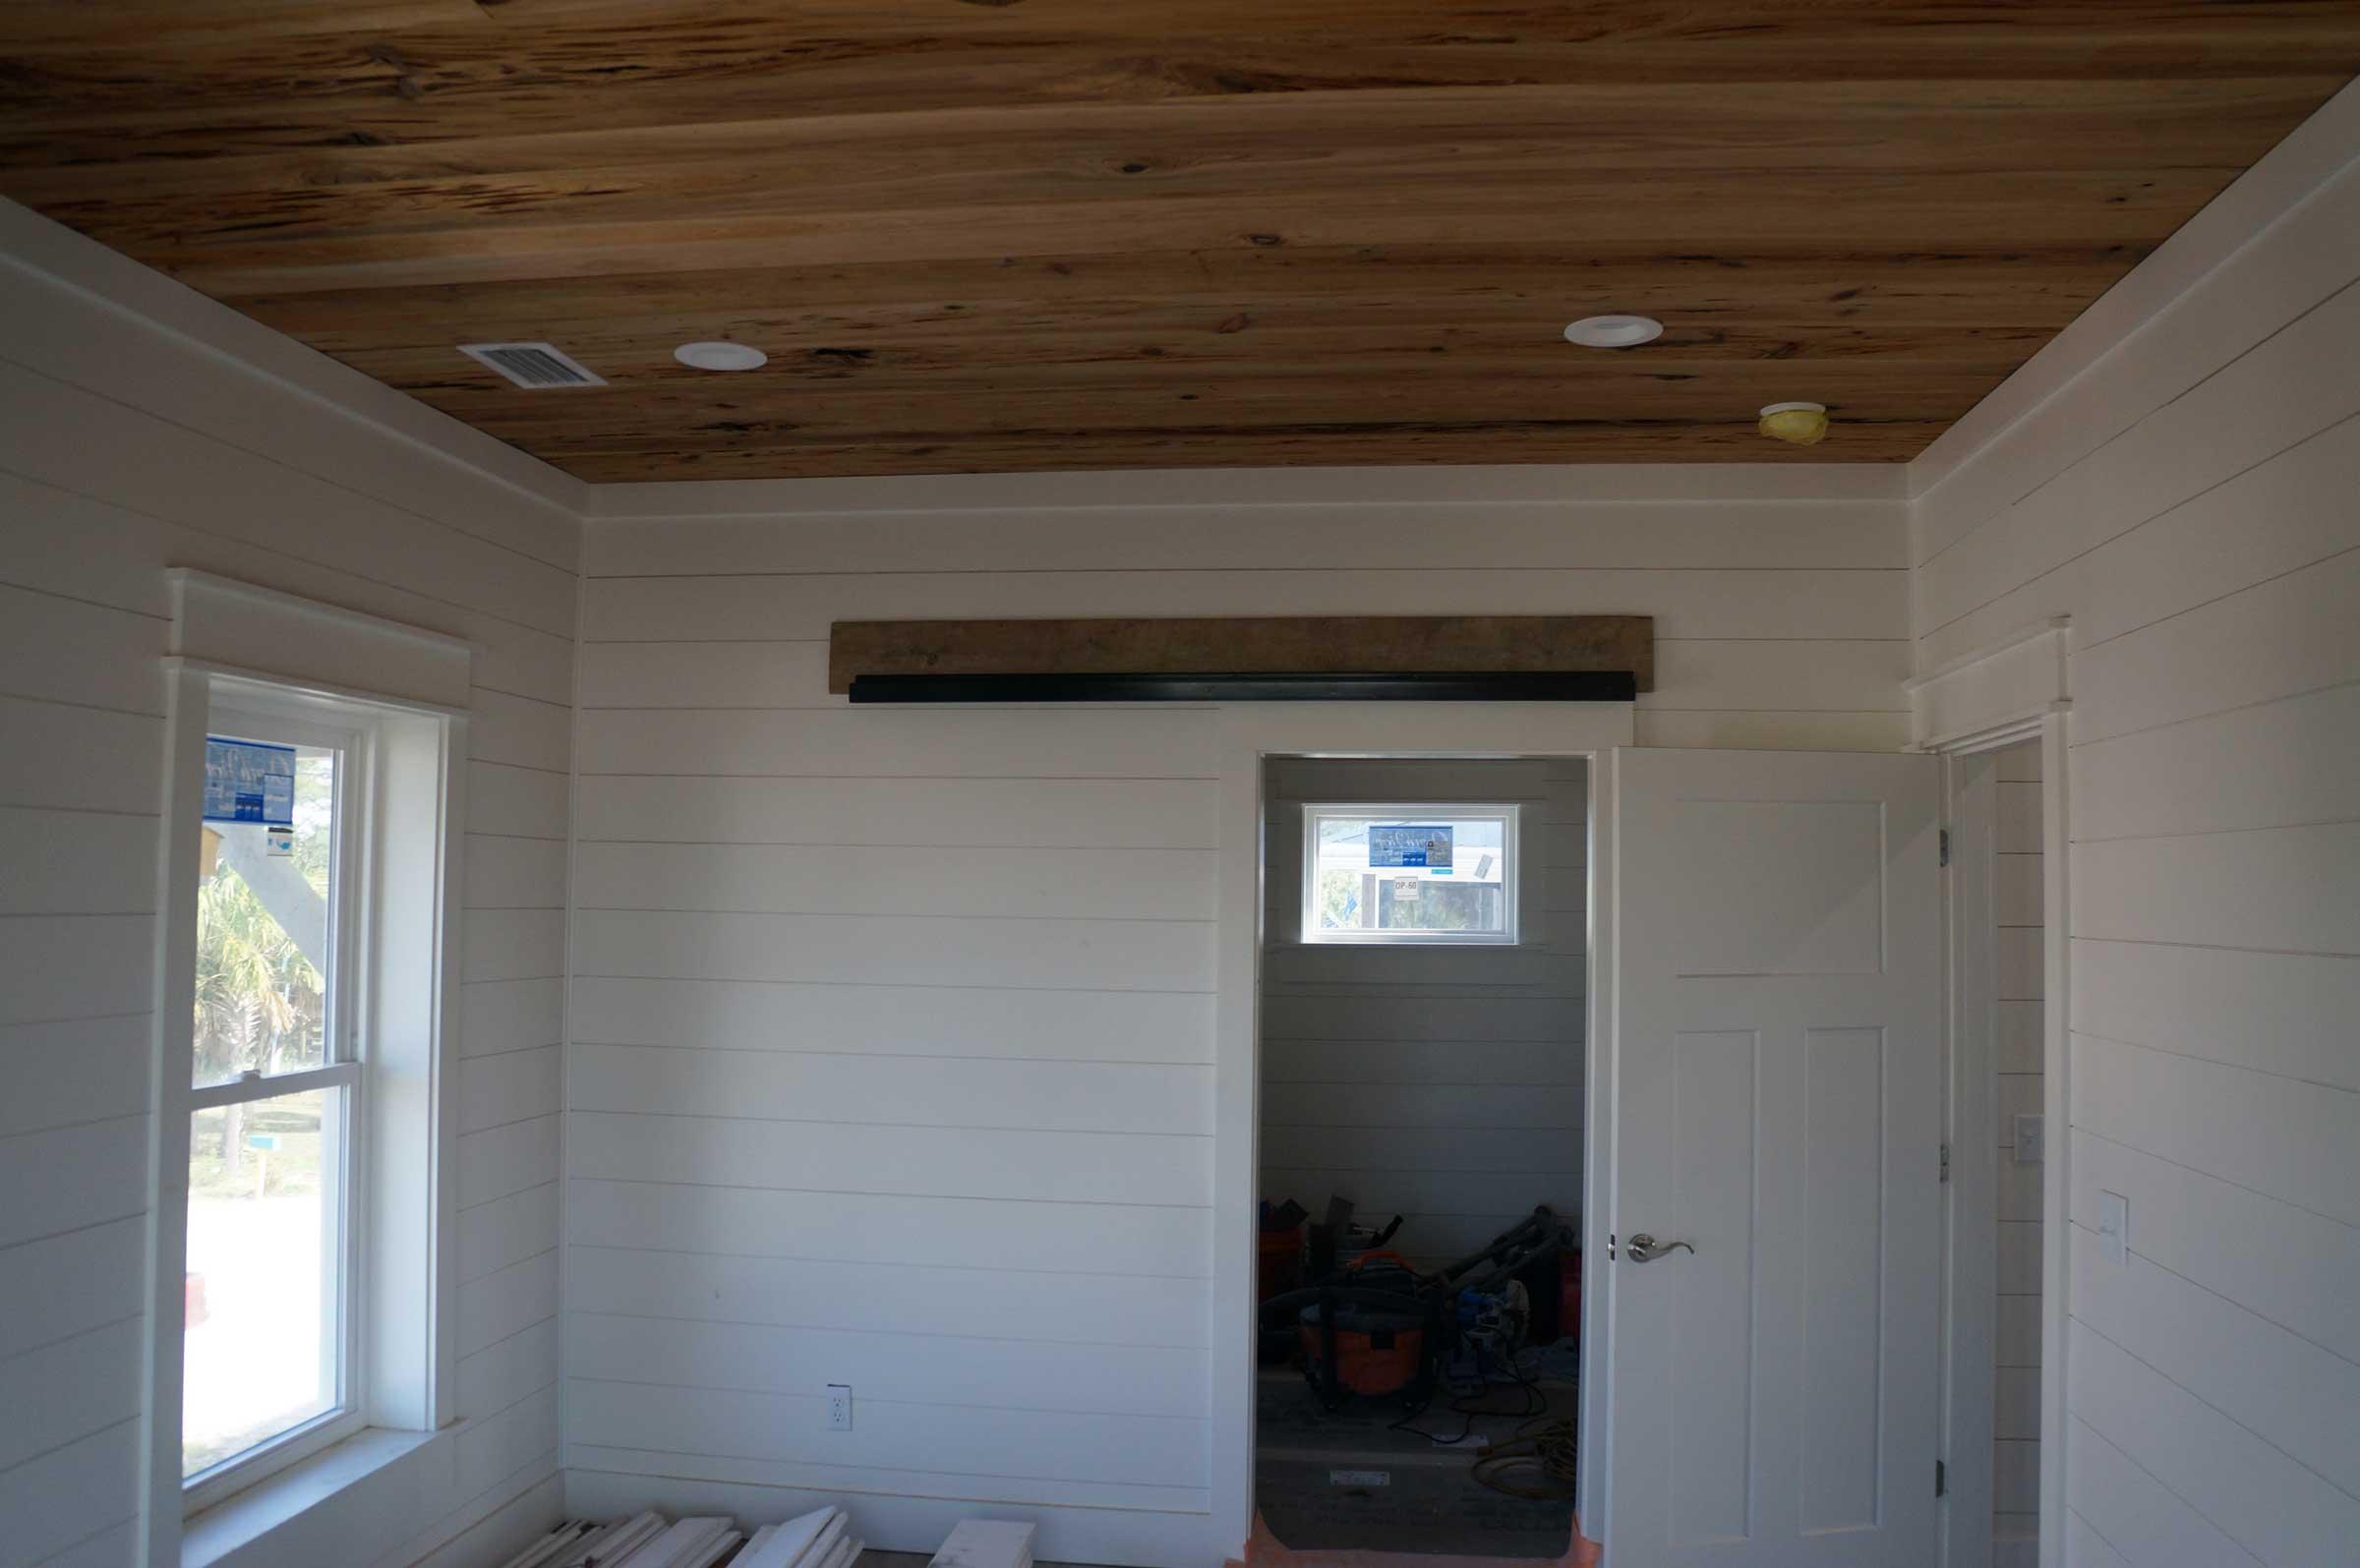 Decorative wood ceiling